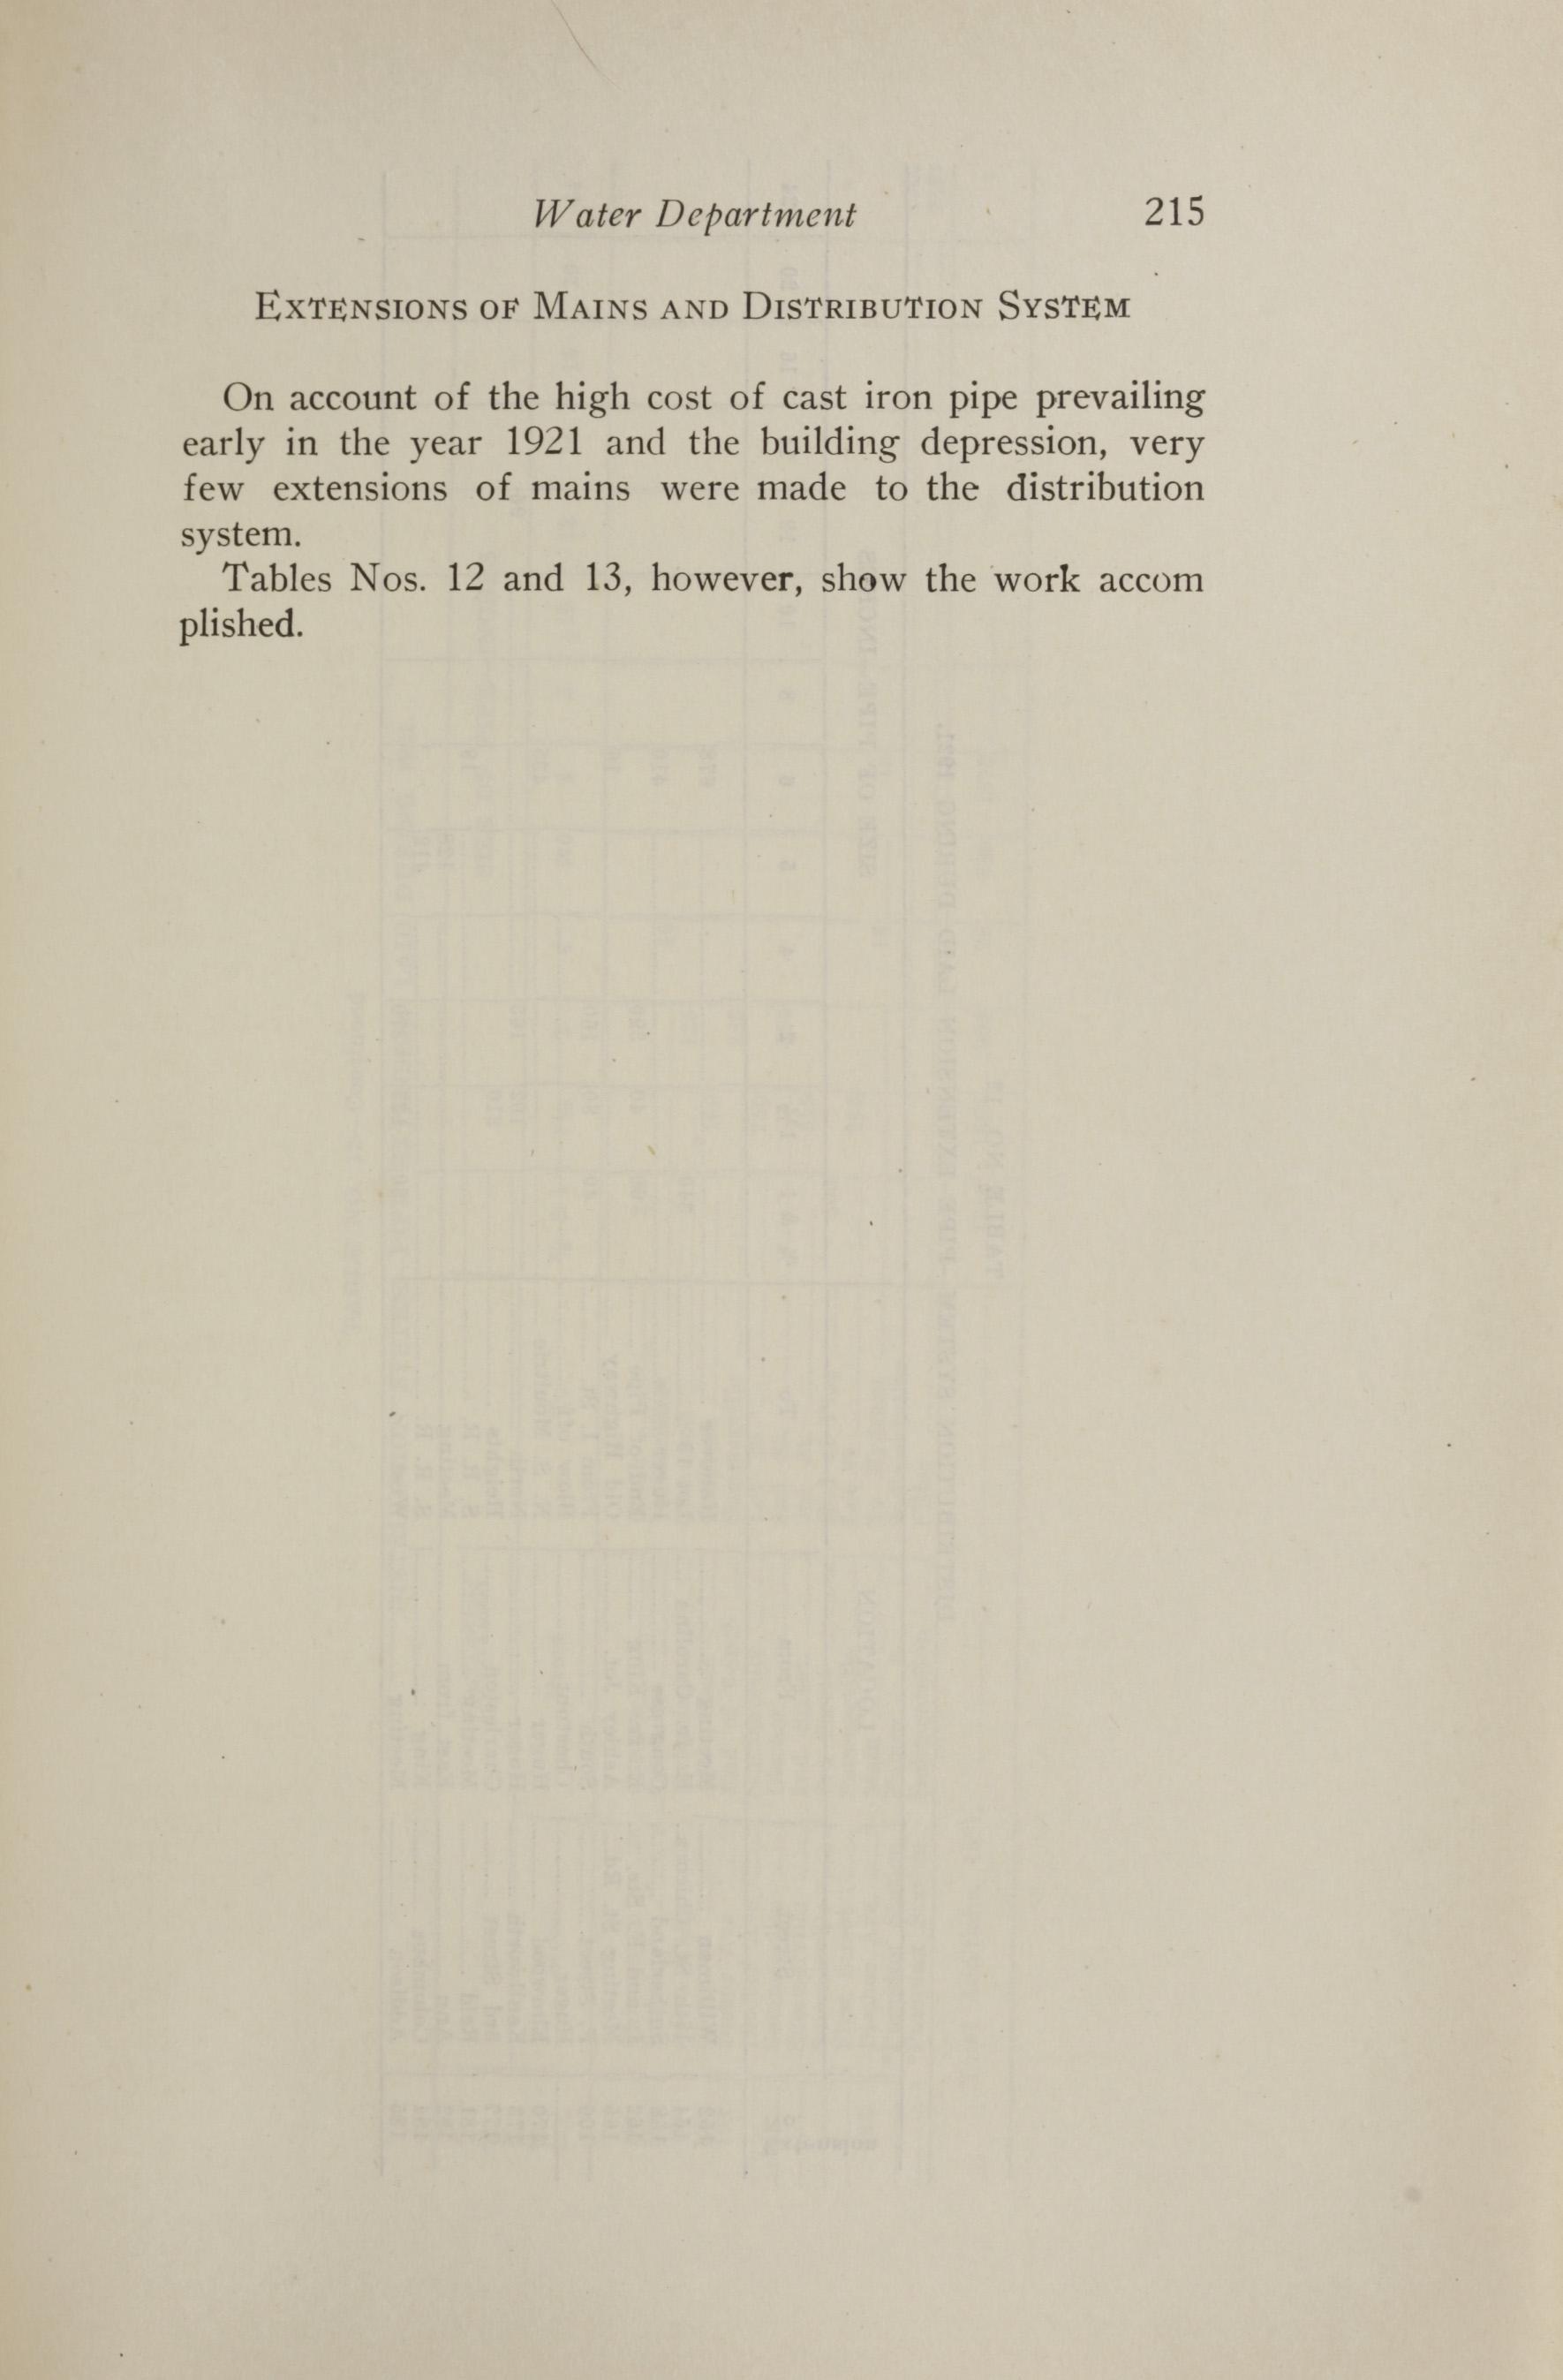 Charleston Yearbook, 1921, page 215